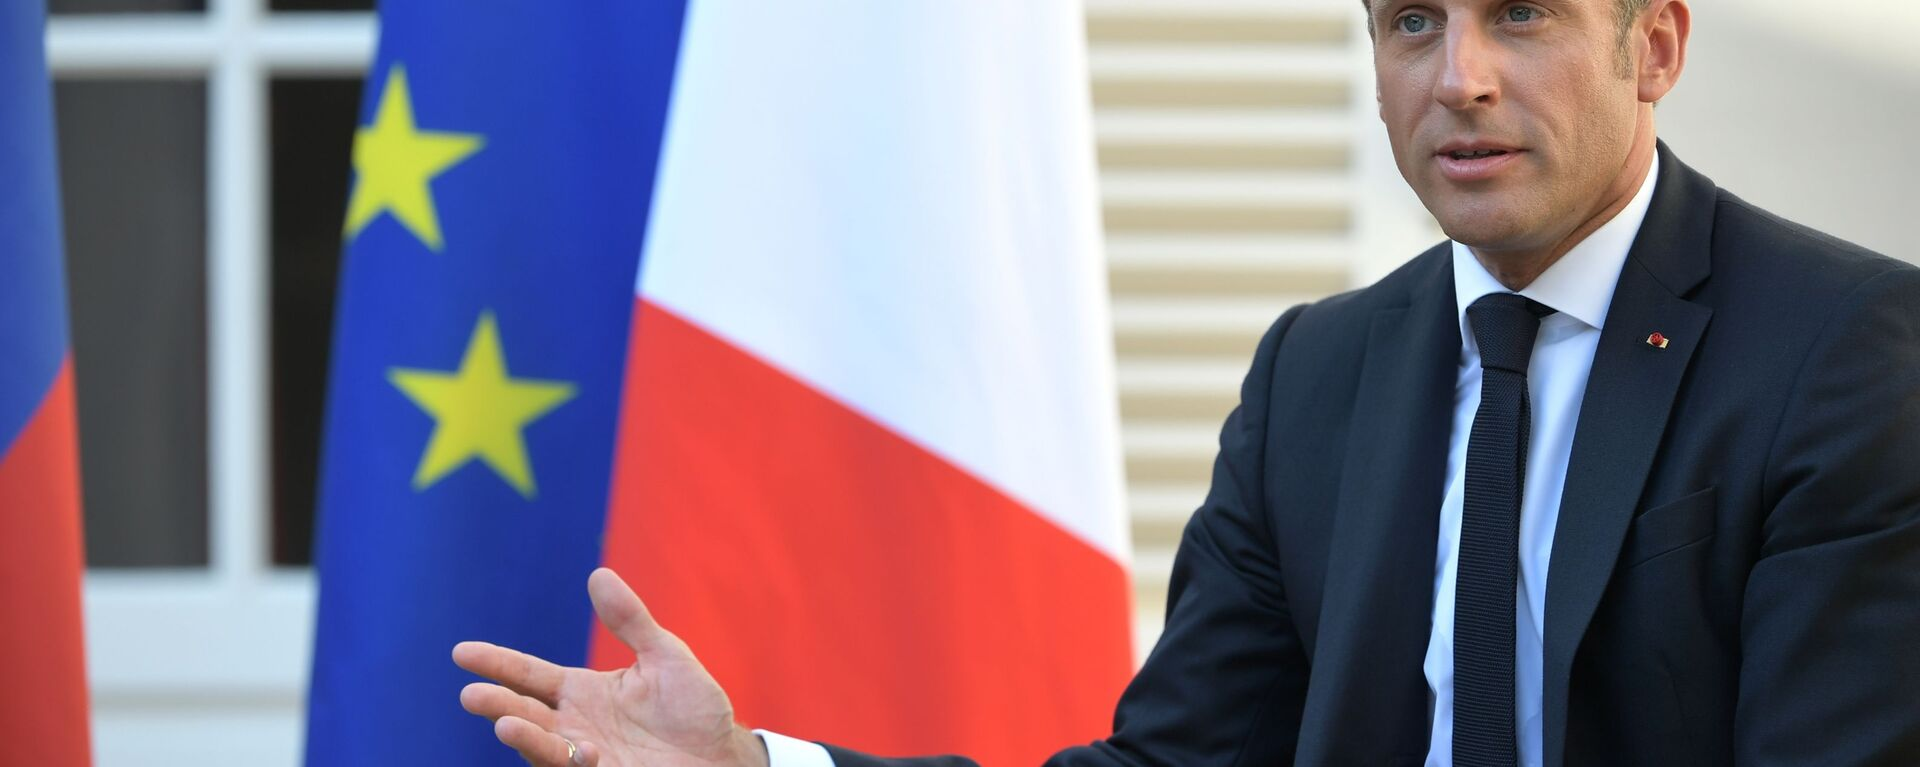 Президент Франции Эммануэль Макрон - Sputnik Таджикистан, 1920, 12.09.2021